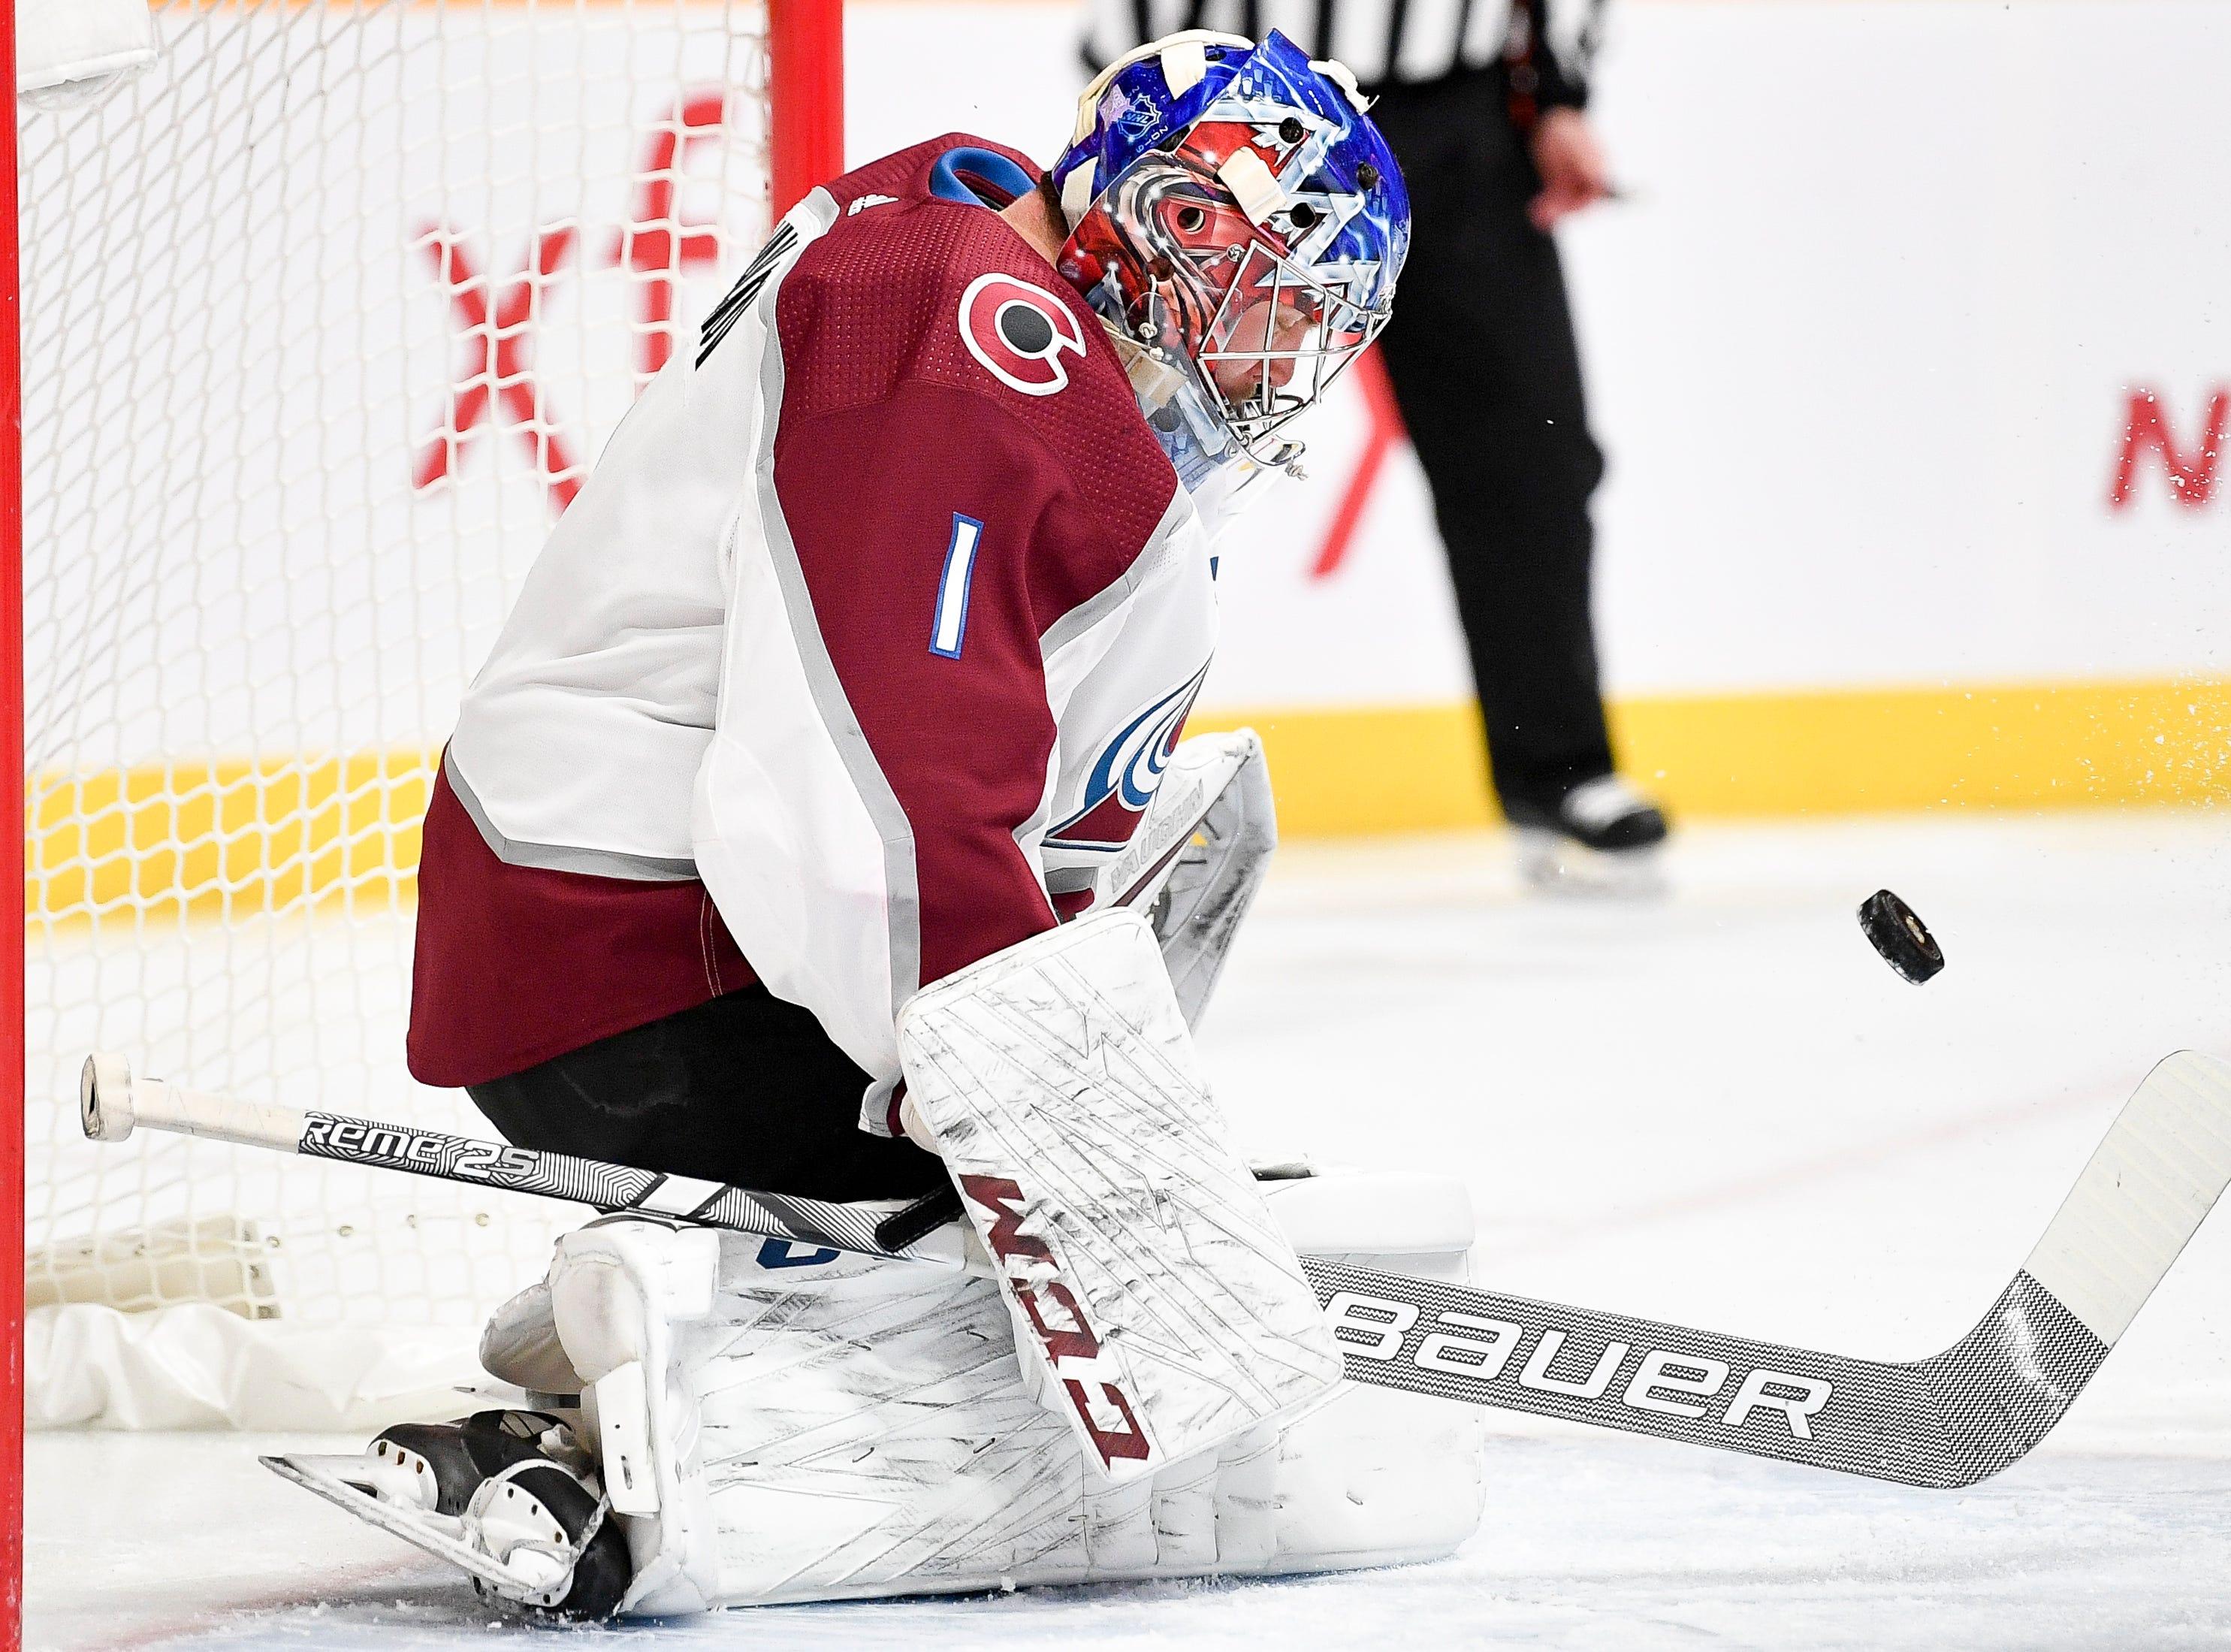 Colorado Avalanche goaltender Semyon Varlamov (1) defends against the Nashville Predators during the first period at Bridgestone Arena in Nashville, Tenn., Tuesday, Nov. 27, 2018.